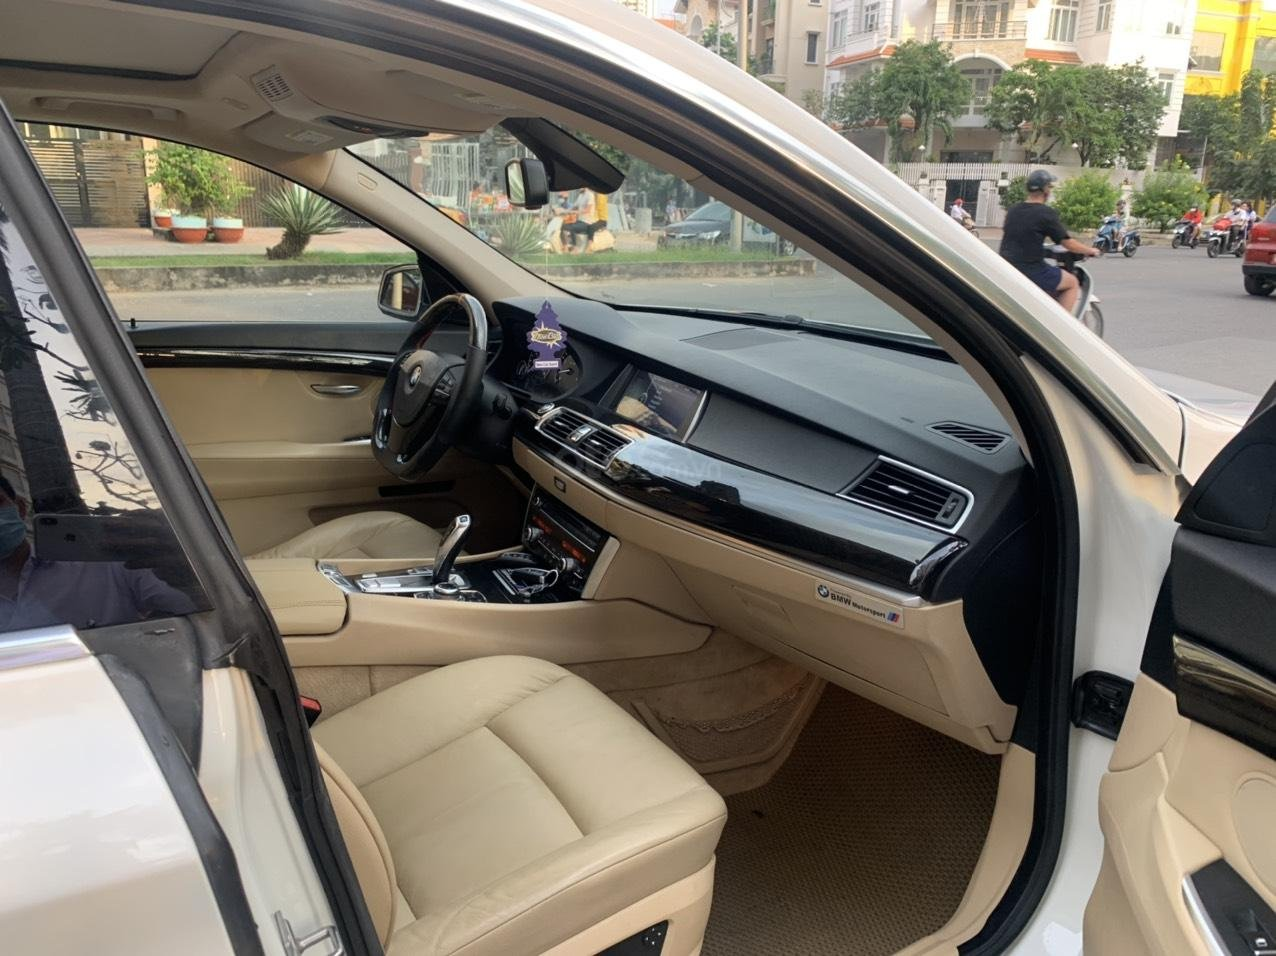 Cần bán gấp BMW 535GT SX 2011, giá 960 triệu (6)